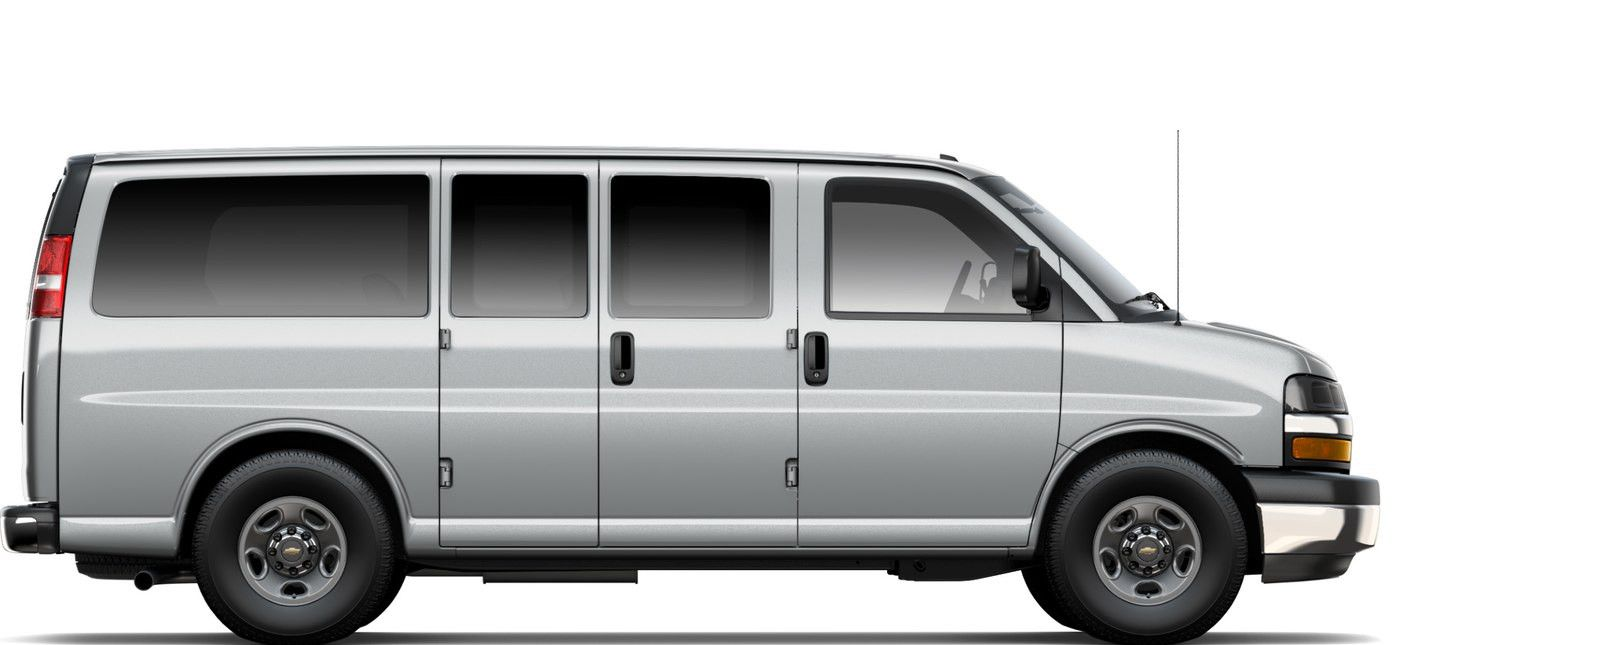 2018 Chevy Express Cargo Van Dengan Gambar